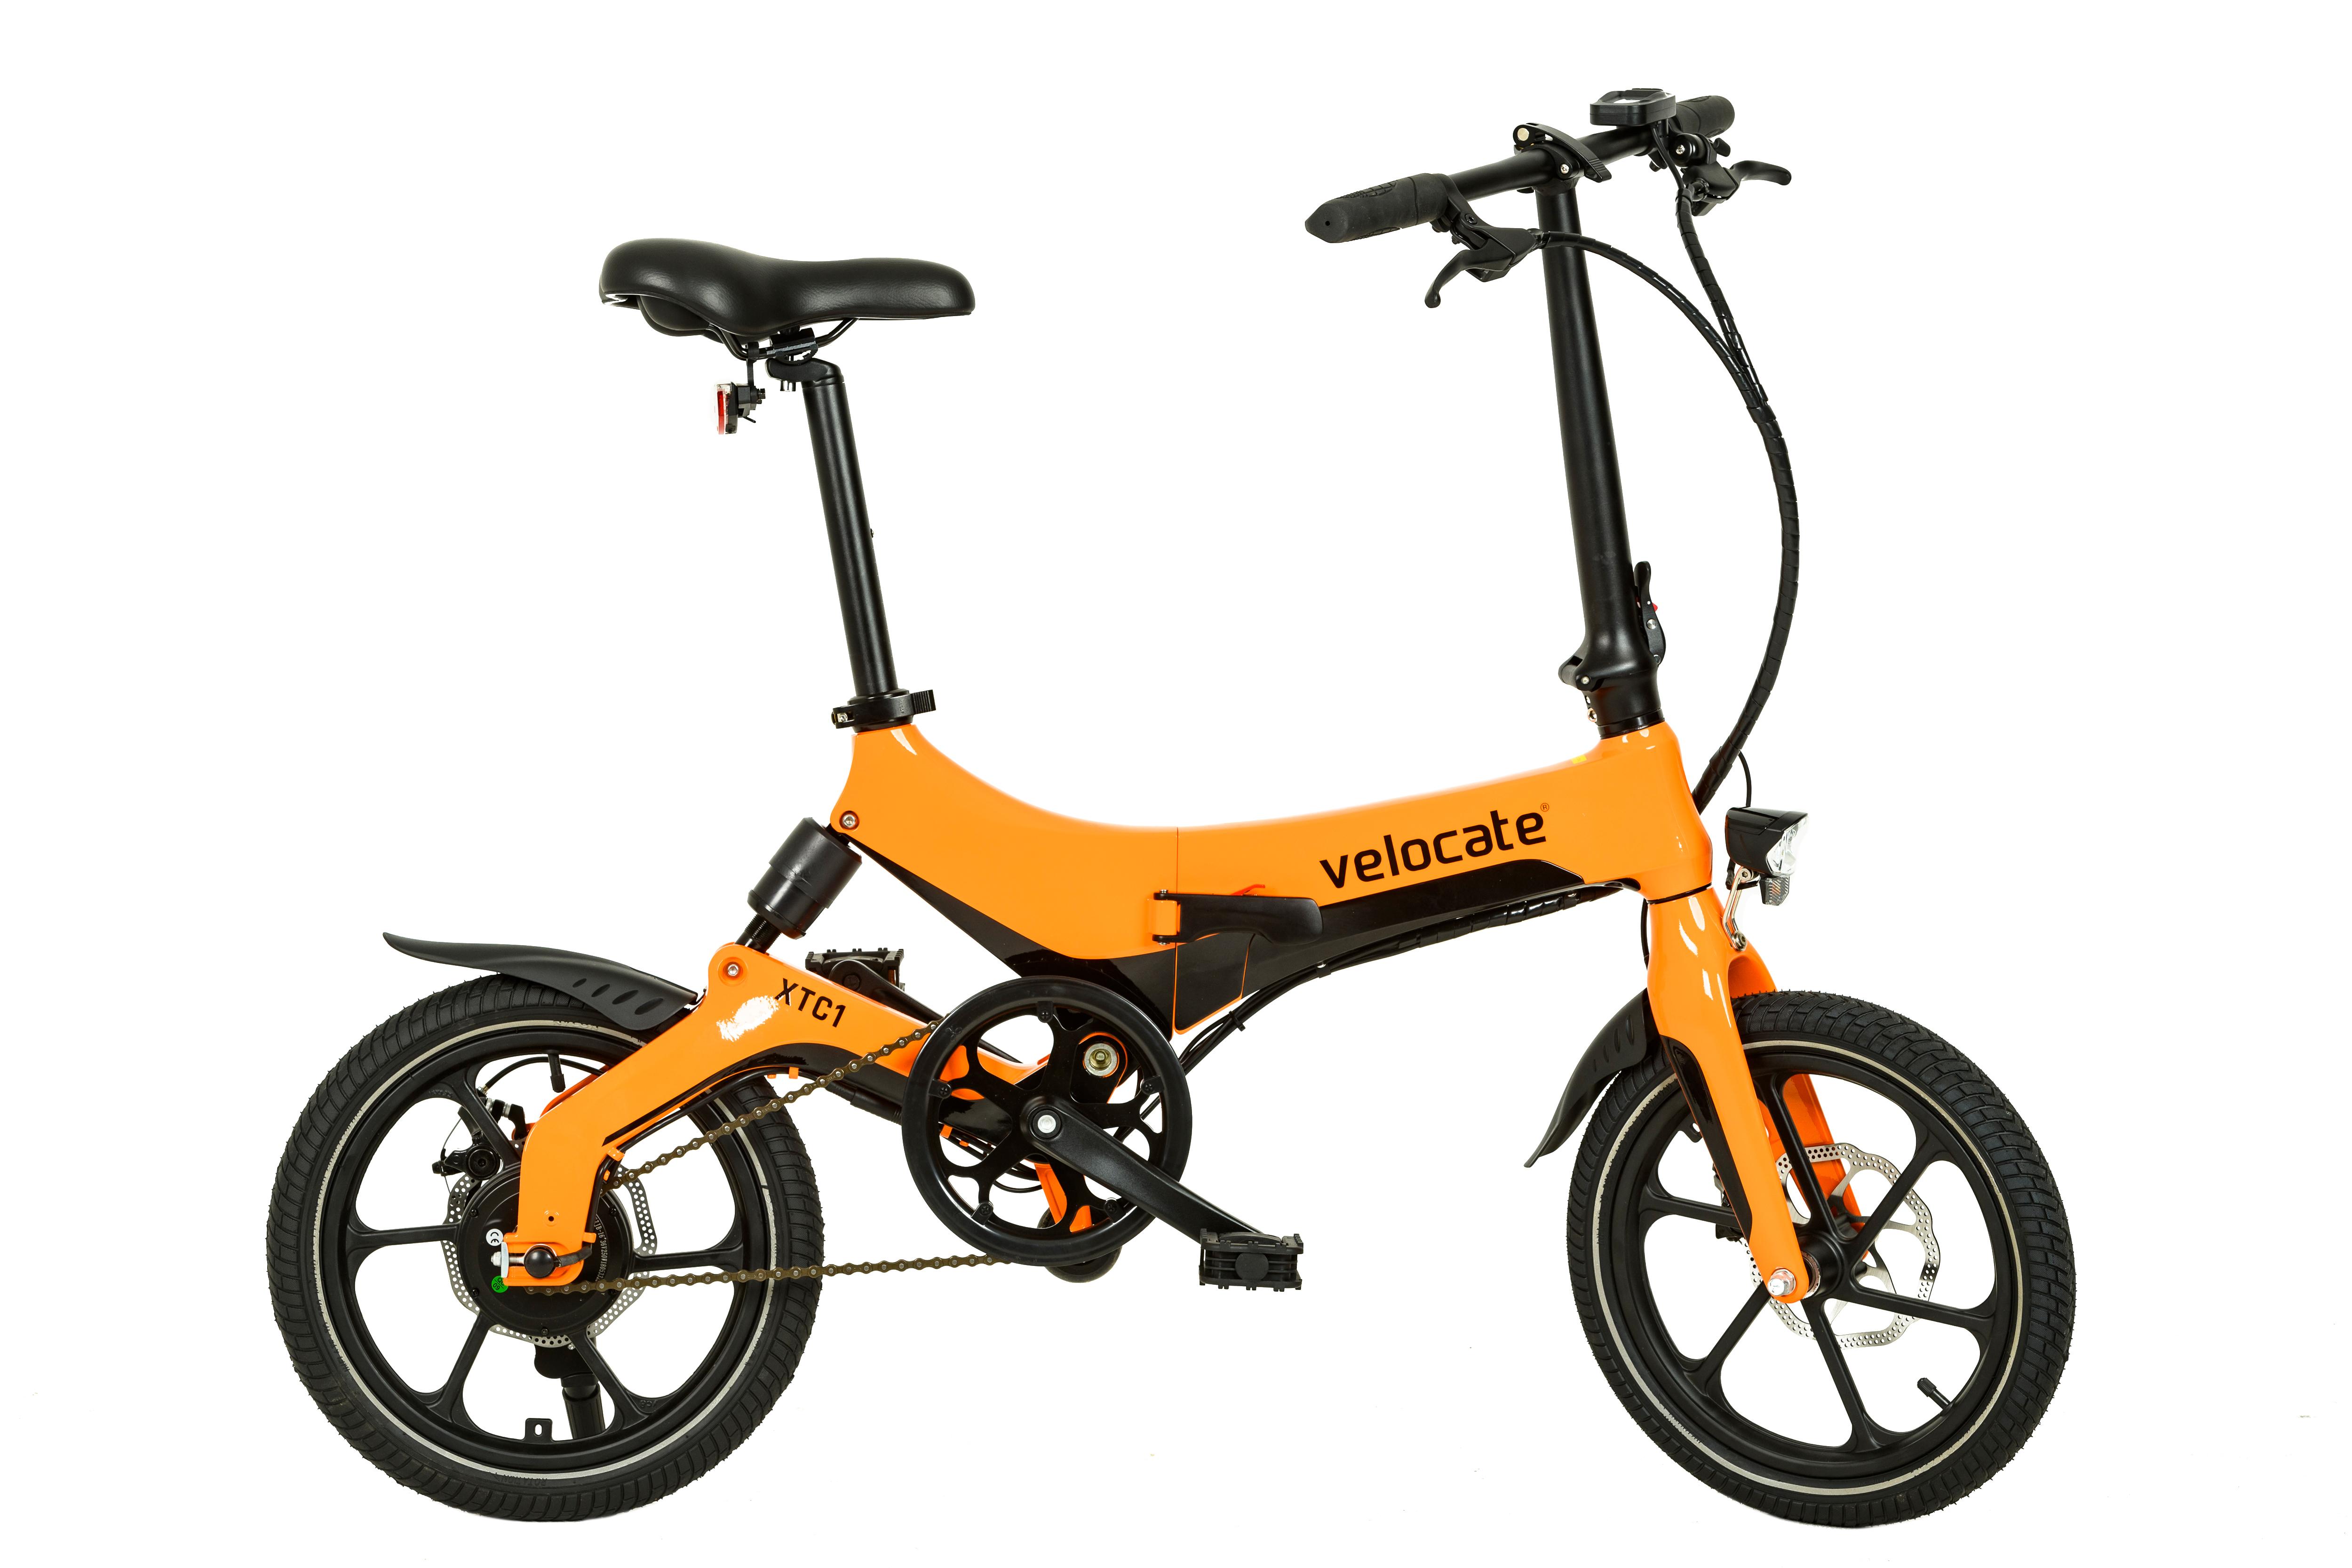 faltbares e bike velocate xtc1 orange e mobilit t. Black Bedroom Furniture Sets. Home Design Ideas